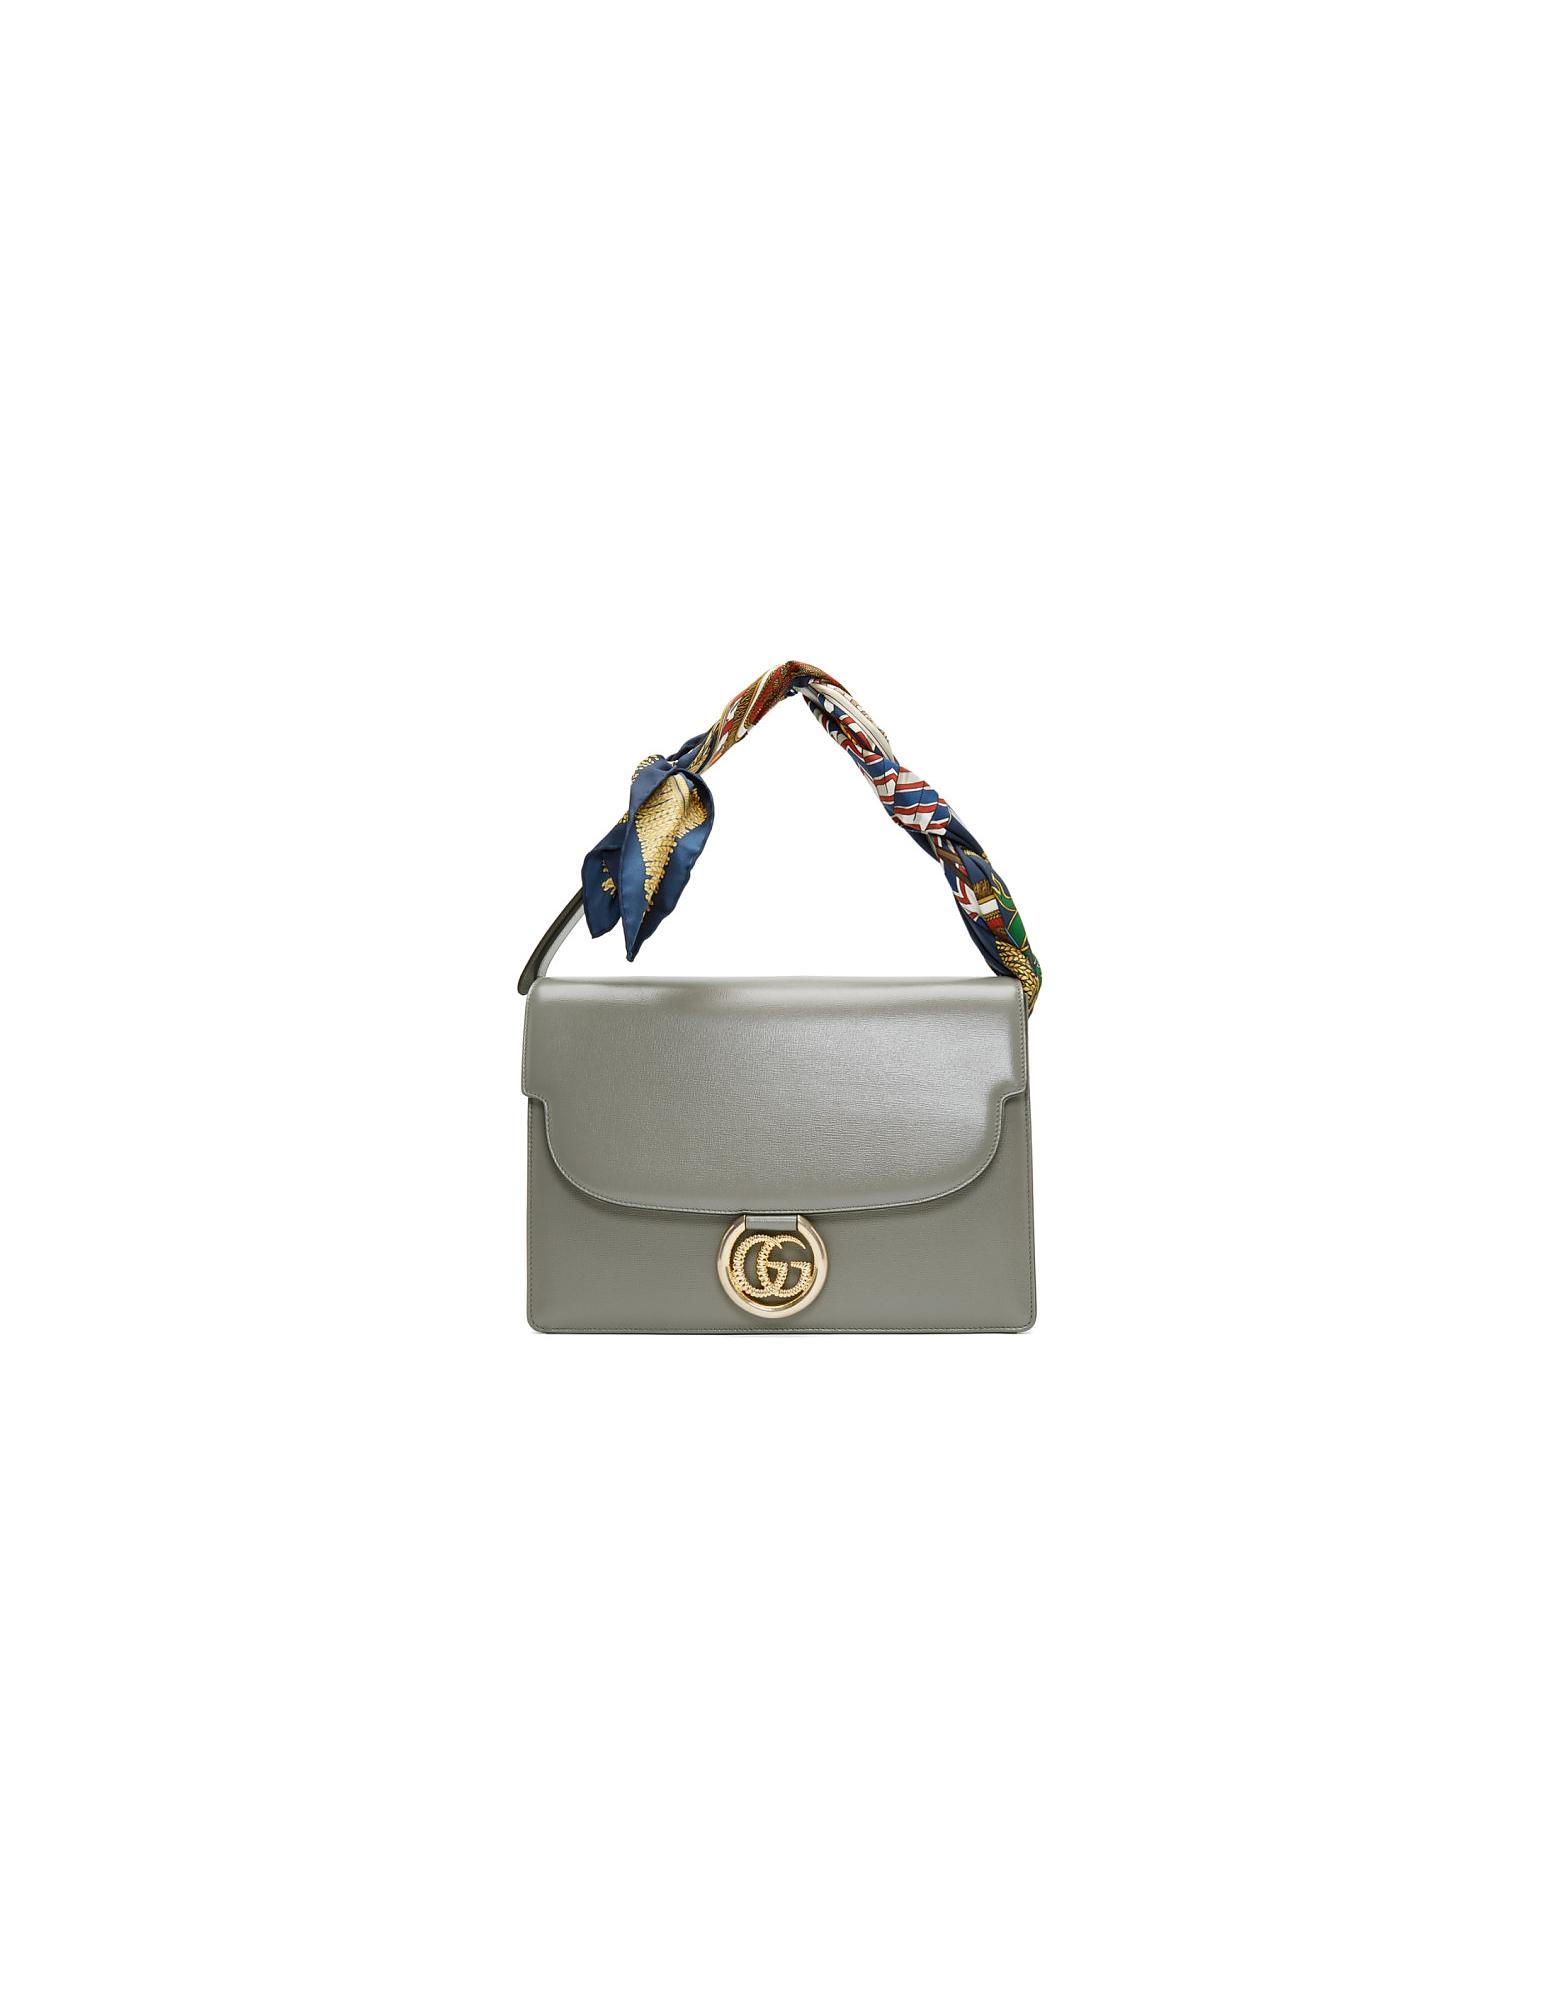 Gucci Designer Handbags, Grey Medium GG Ring Scarf Shoulder Bag